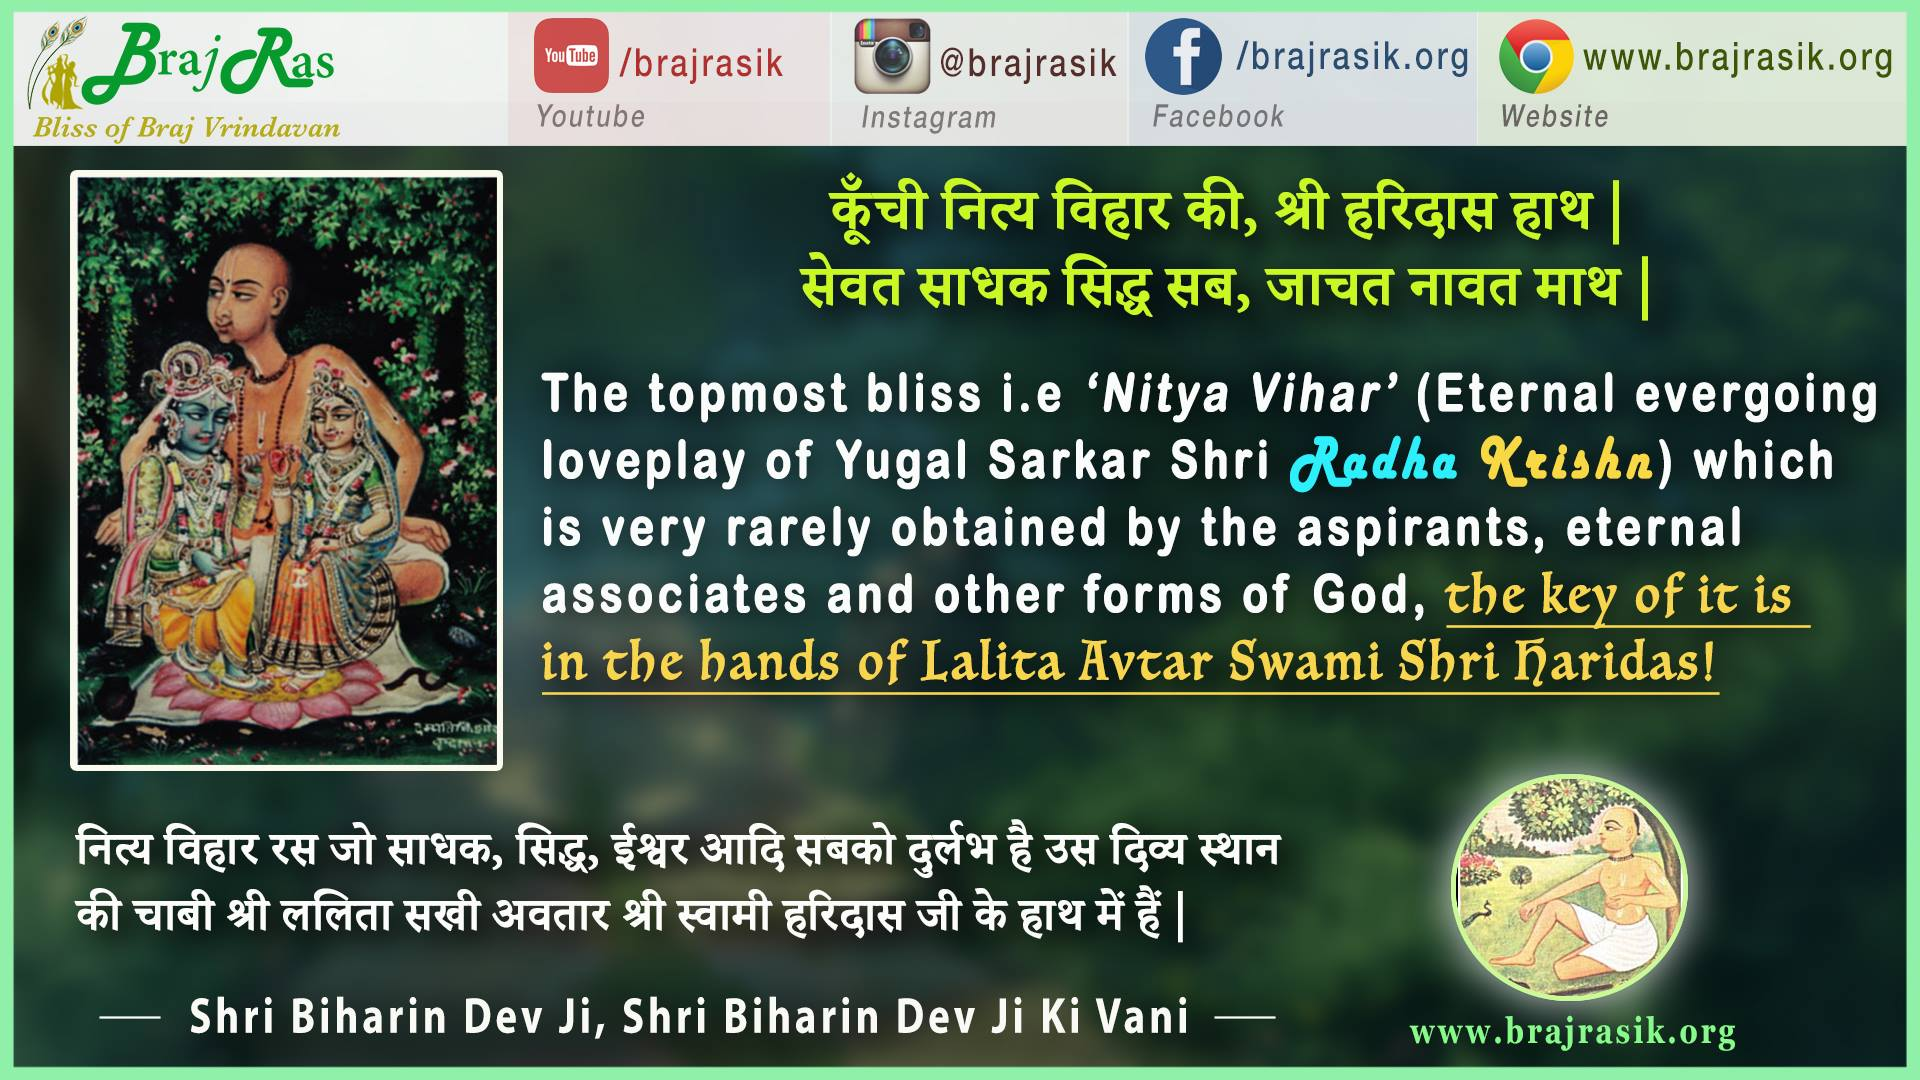 Kunchi Nitya Vihar Ki, Shri Haridas Hath - Shri Biharin Dev Ji, Shri Biharin Dev Ji Ki Vani